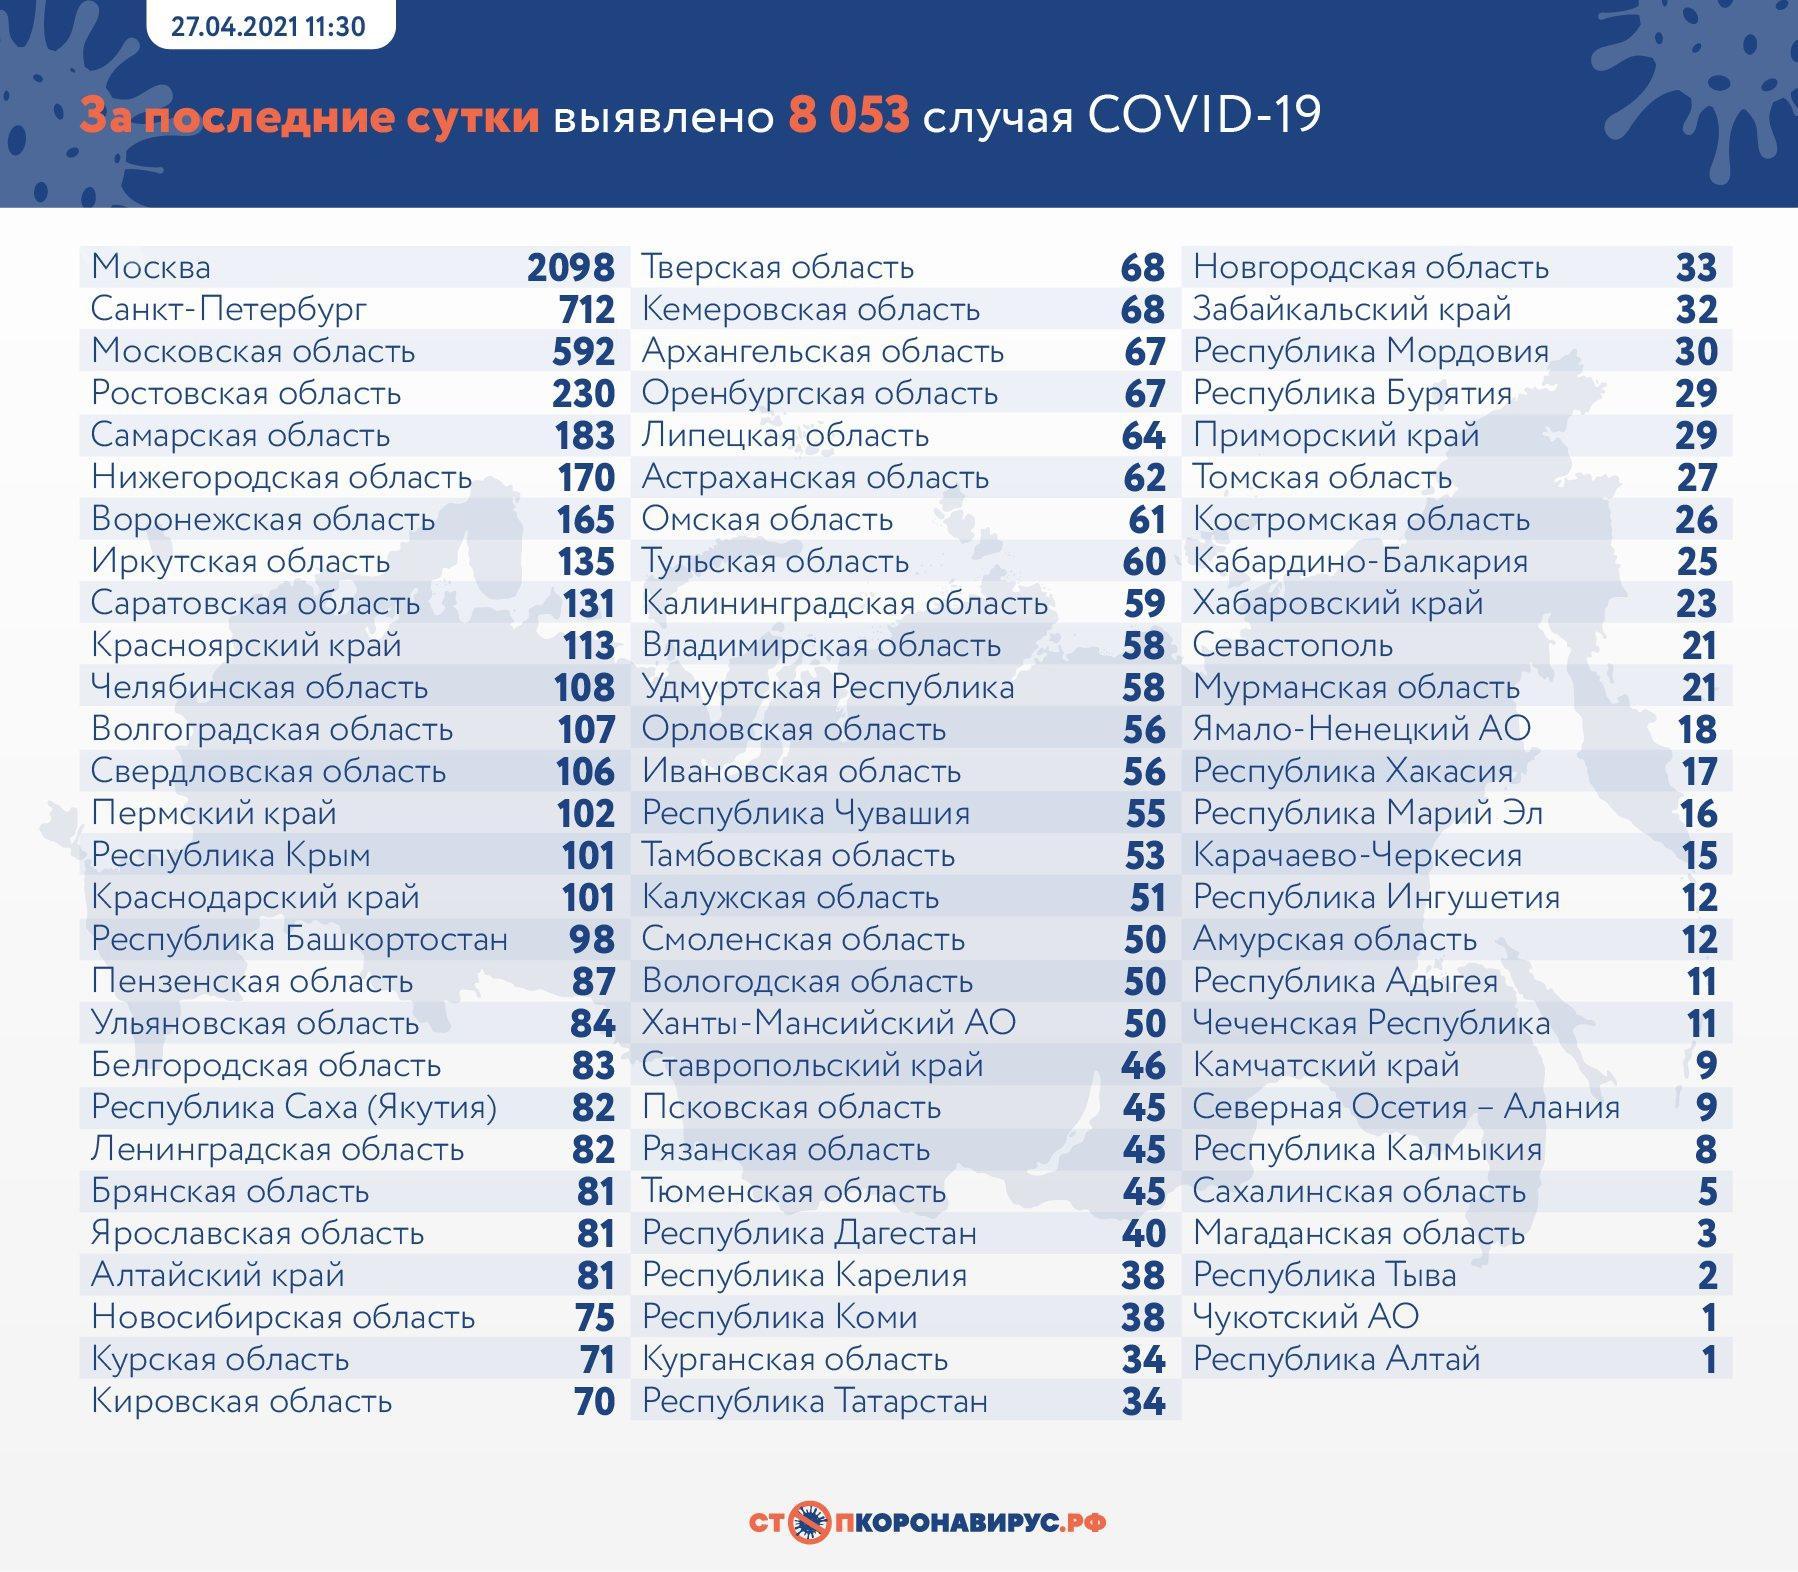 фото В России за сутки от коронавируса умерли 392 человека 2